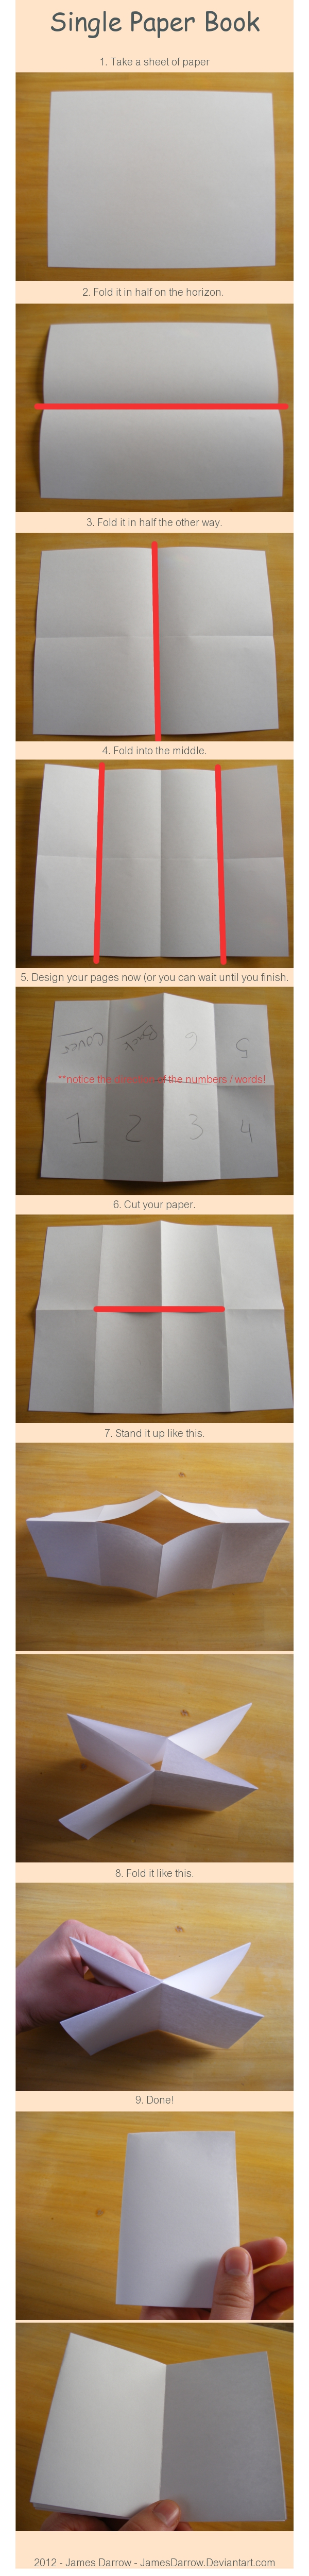 Single Paper Book by JamesDarrow